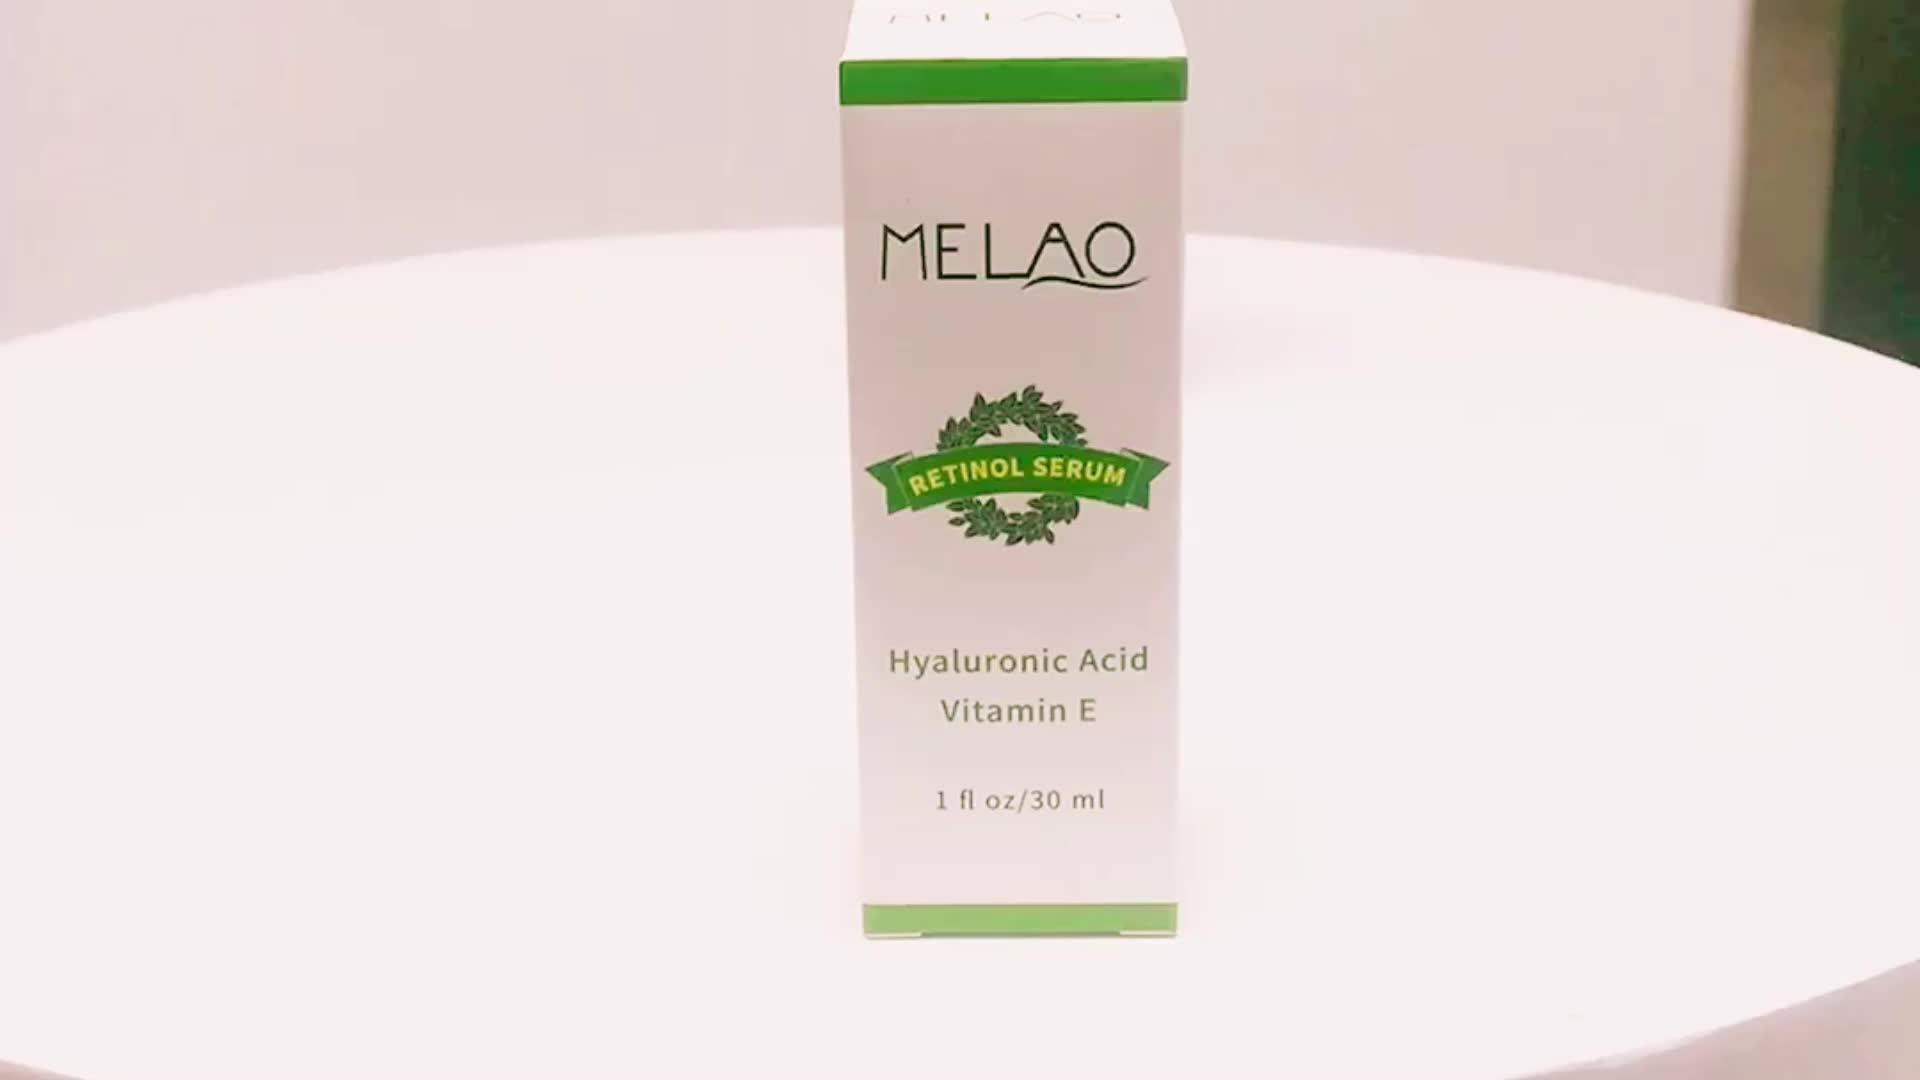 Melao 30ml 1fl oz retinol serum 2.5% with hyaluronic acid vitamin E Wholesale